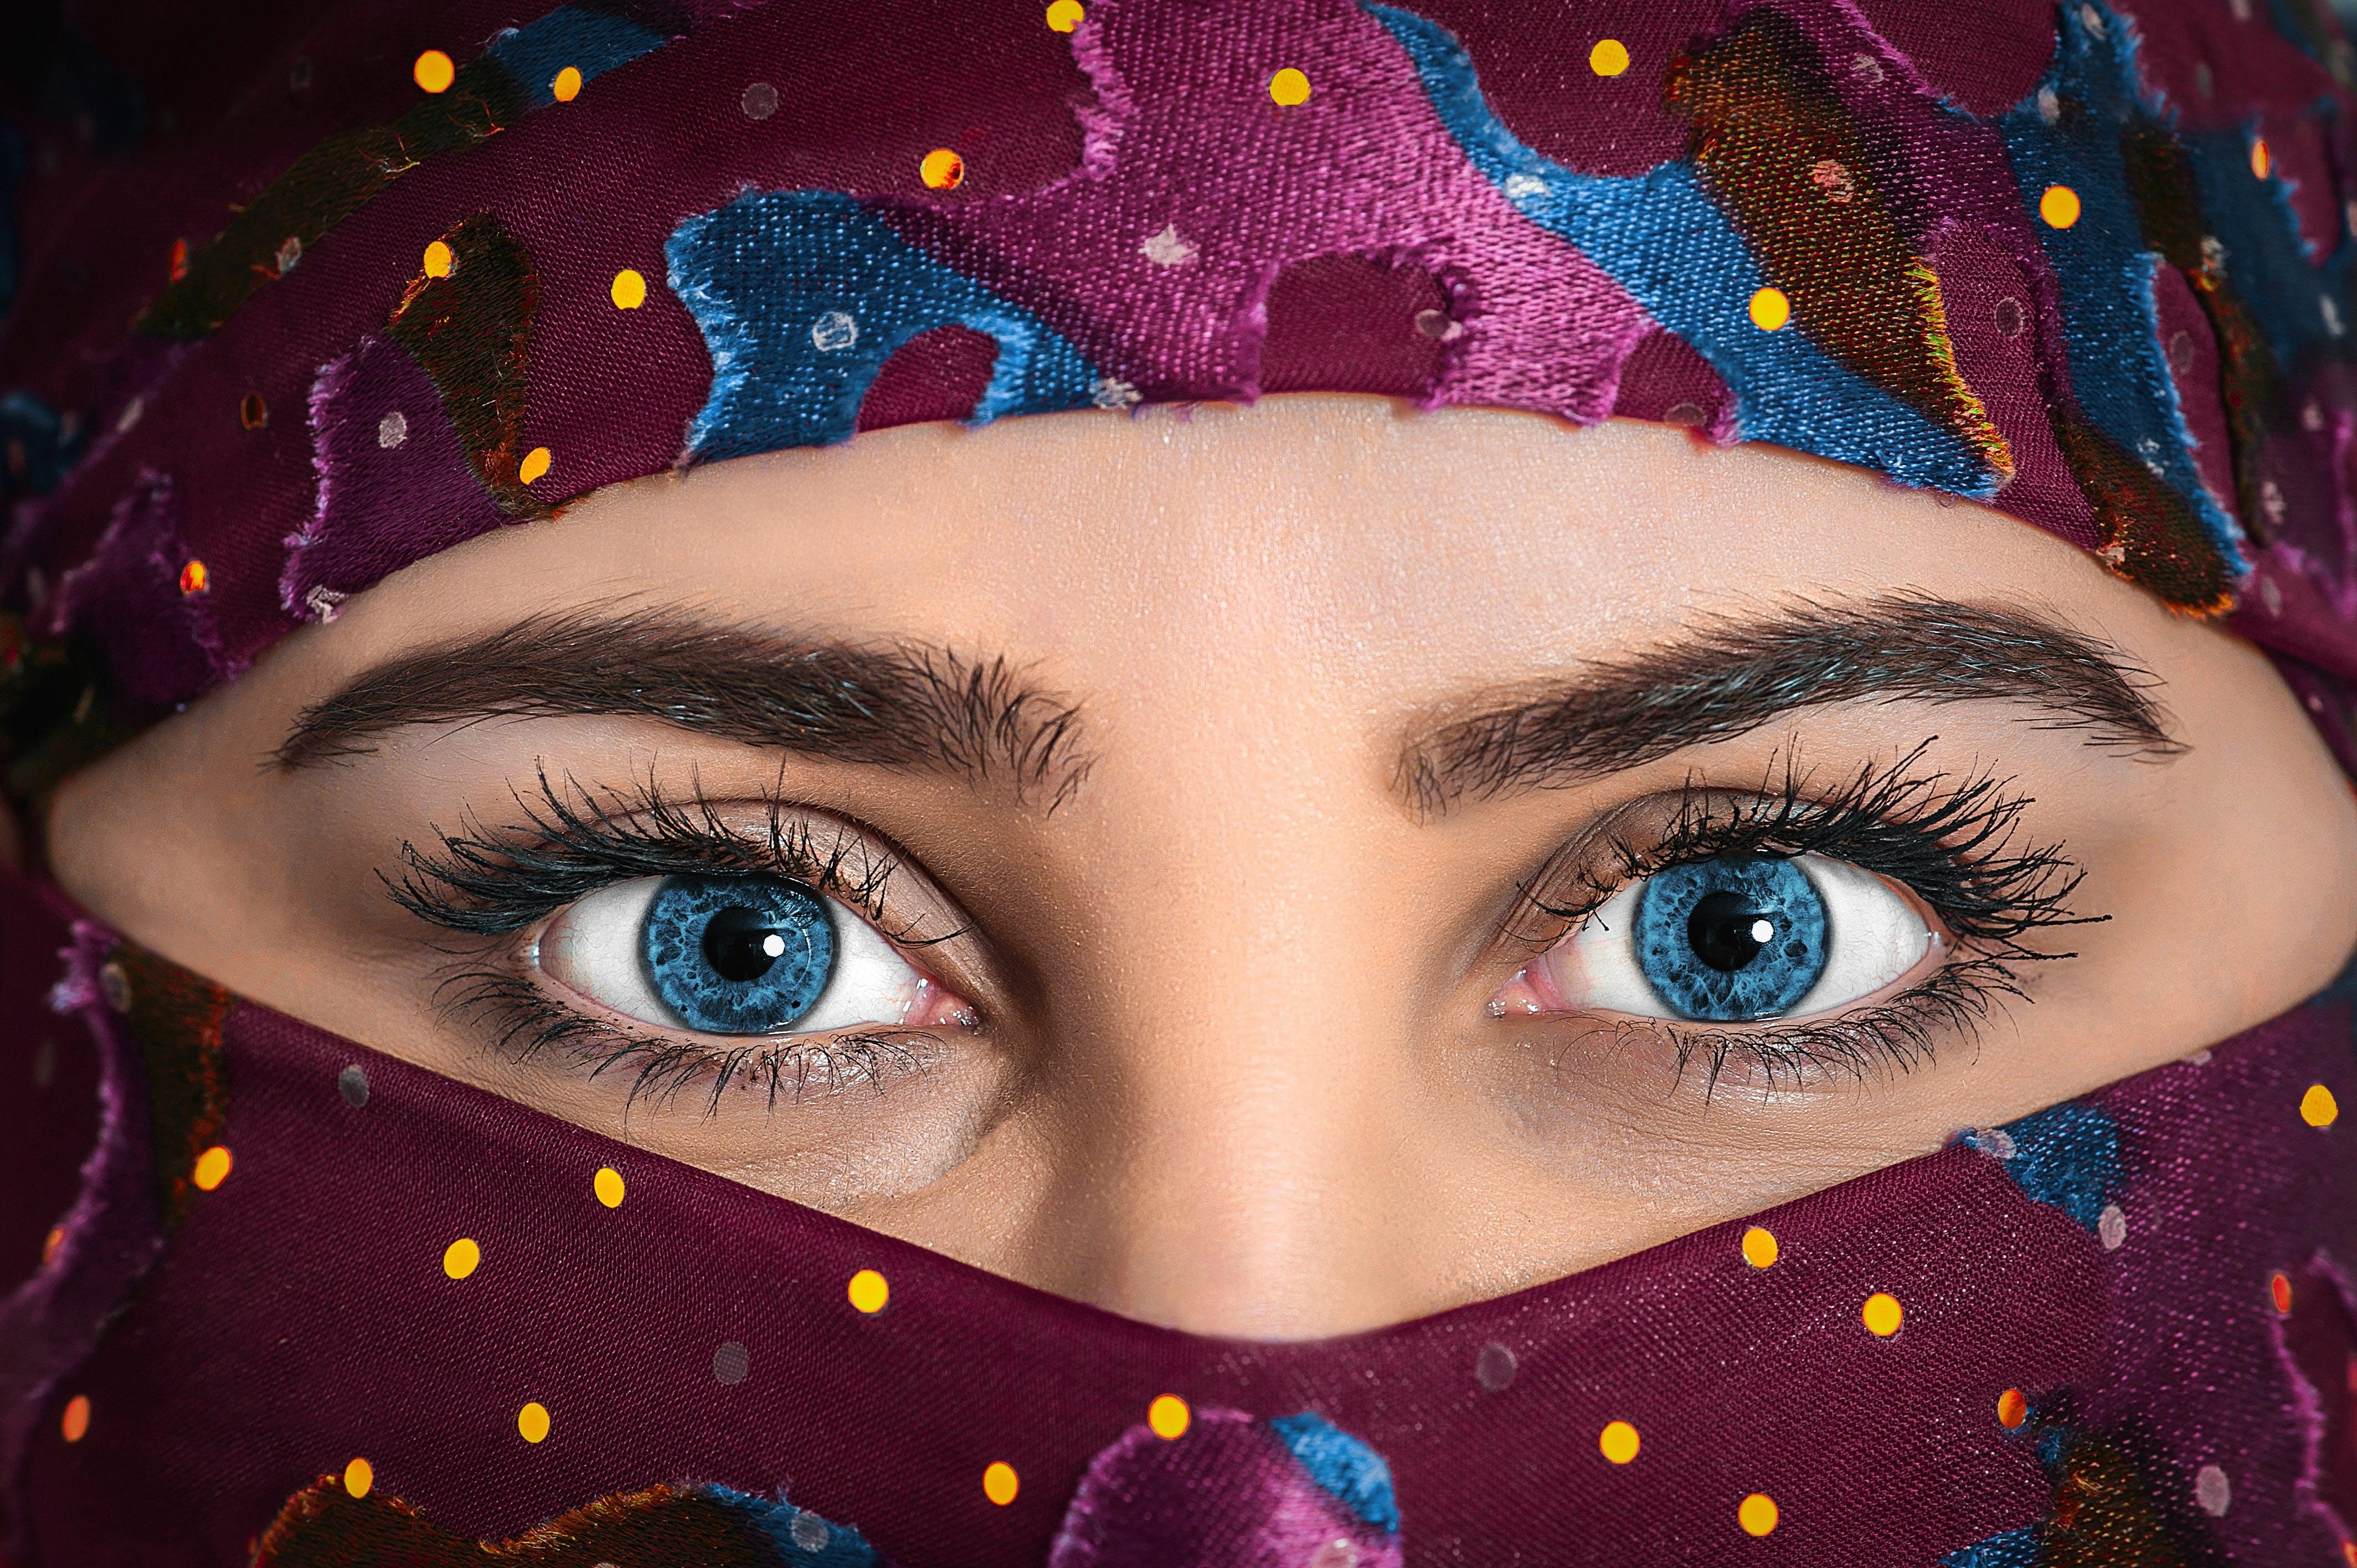 Woman With Blue Eyes Wearing Purple Hijab Scarf